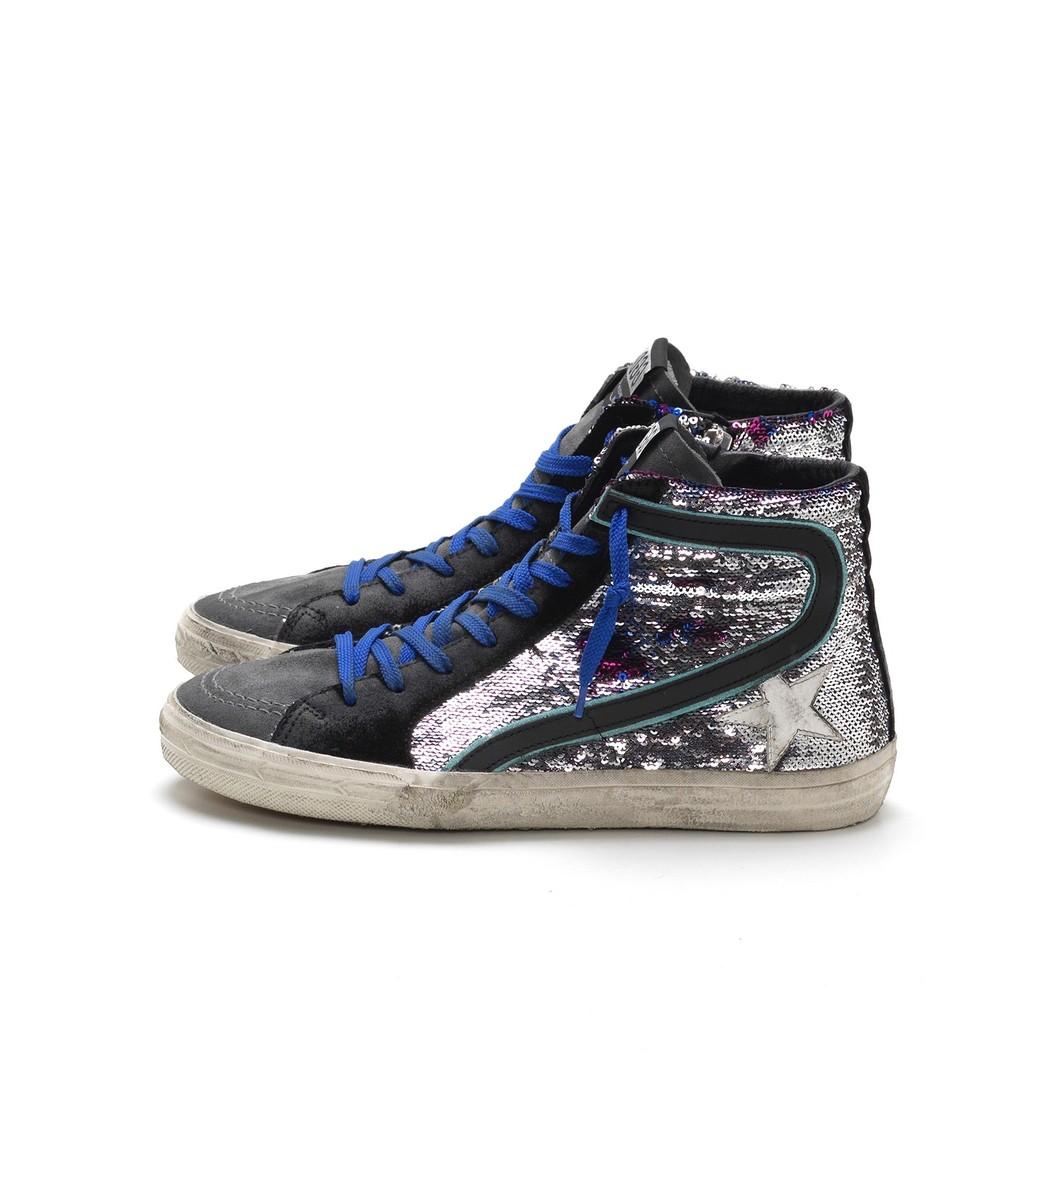 Golden Goose Slide Sneakers In Leopard Paillettes/White Star In Leopard Print